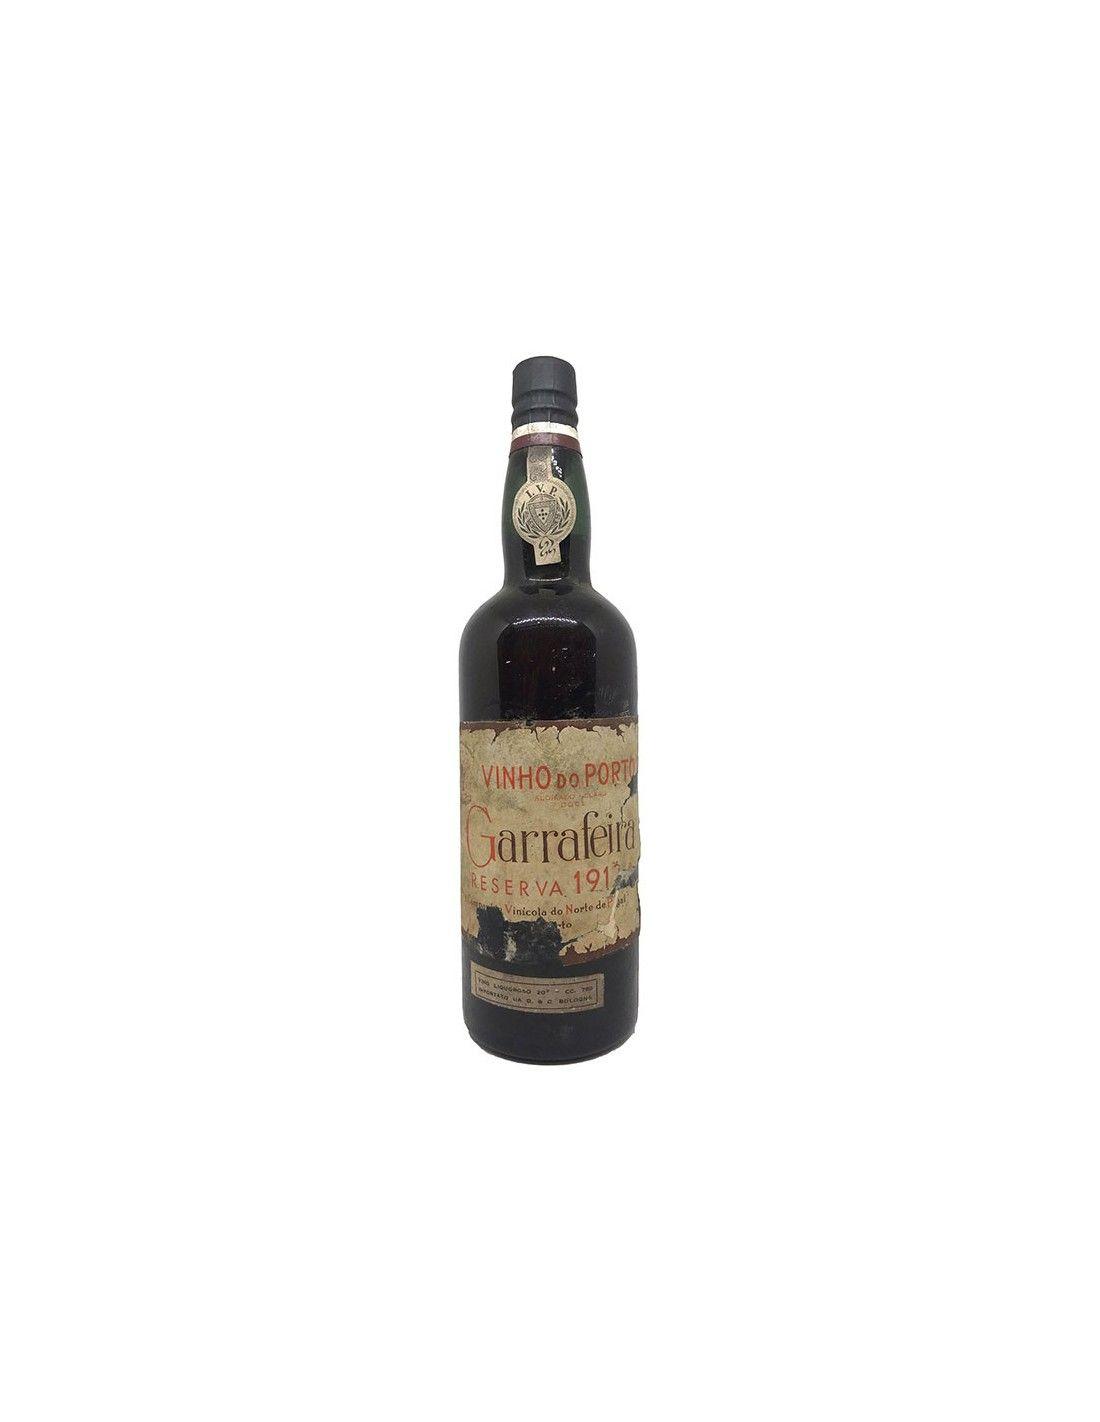 Vinho Do Porto Garrafeira 1912 REAL COMPANHIA VINICOLA GRANDI